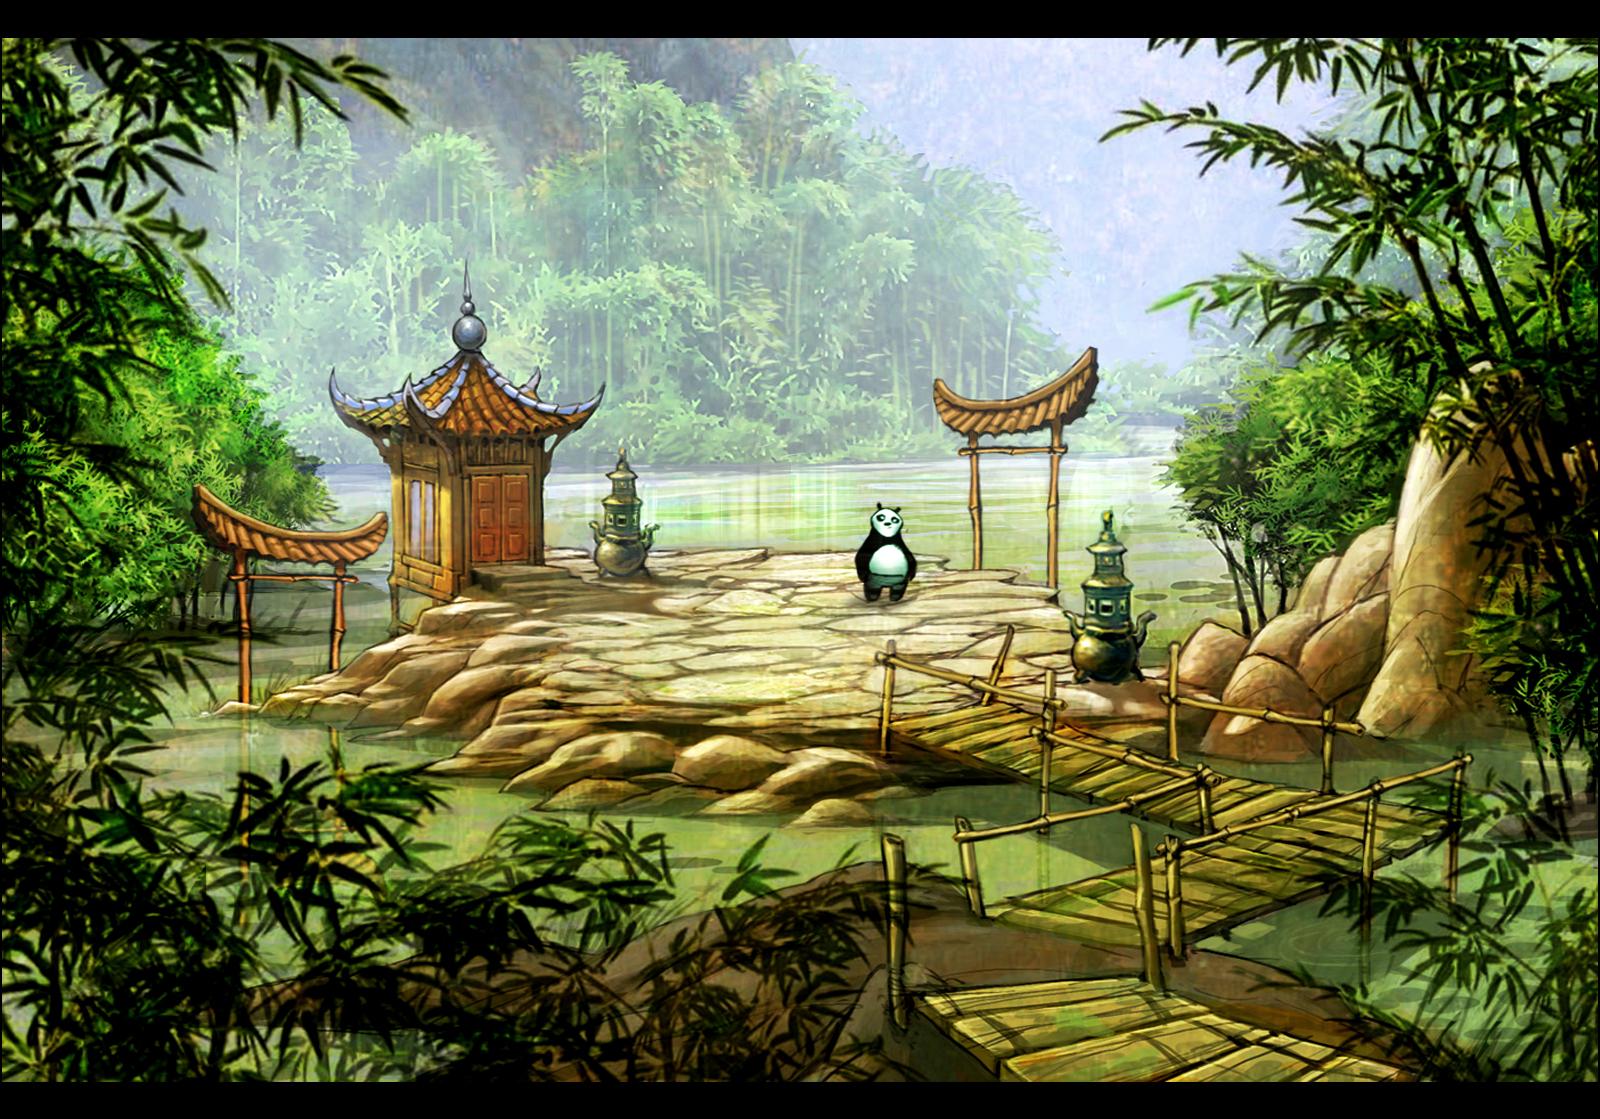 http://4.bp.blogspot.com/-8JA8DBEQp38/TeRkccG0M6I/AAAAAAAABuY/UqW7XkePDFA/s1600/KungFuPanda2_BambooJunglet+-+Copy.jpg